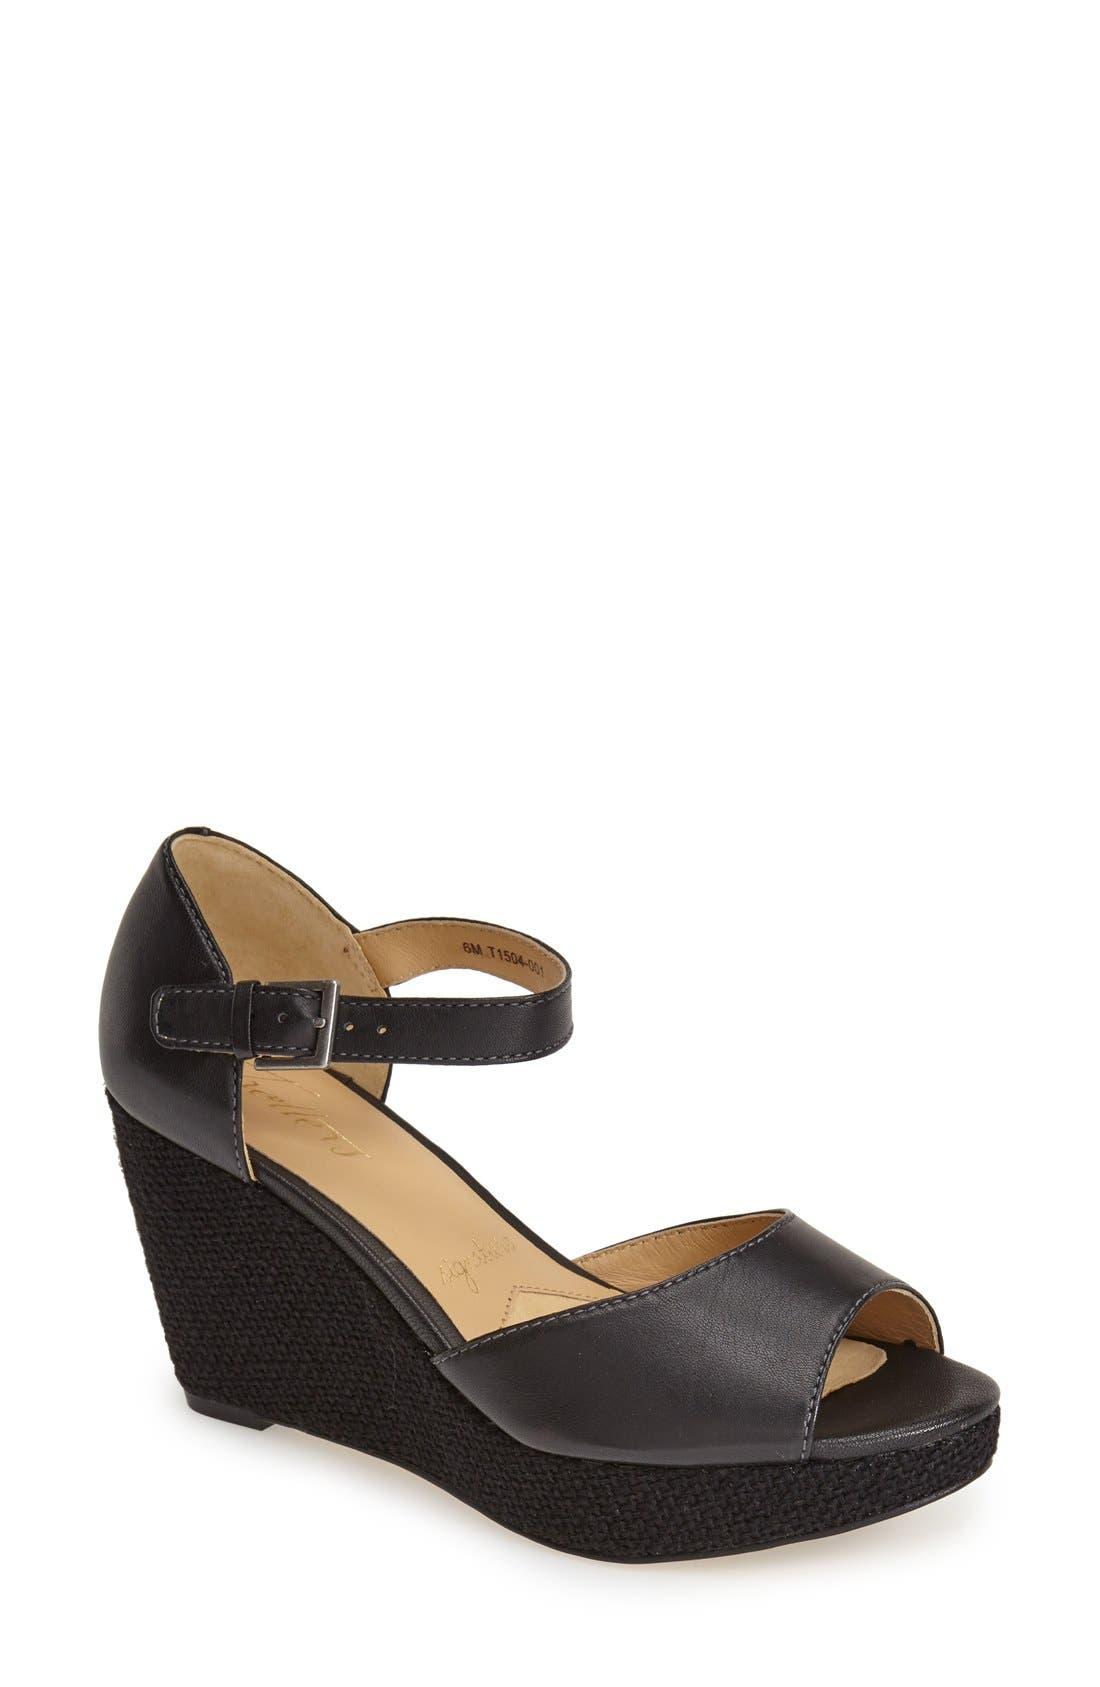 Main Image - Trotters 'Amber' Wedge Sandal (Women)